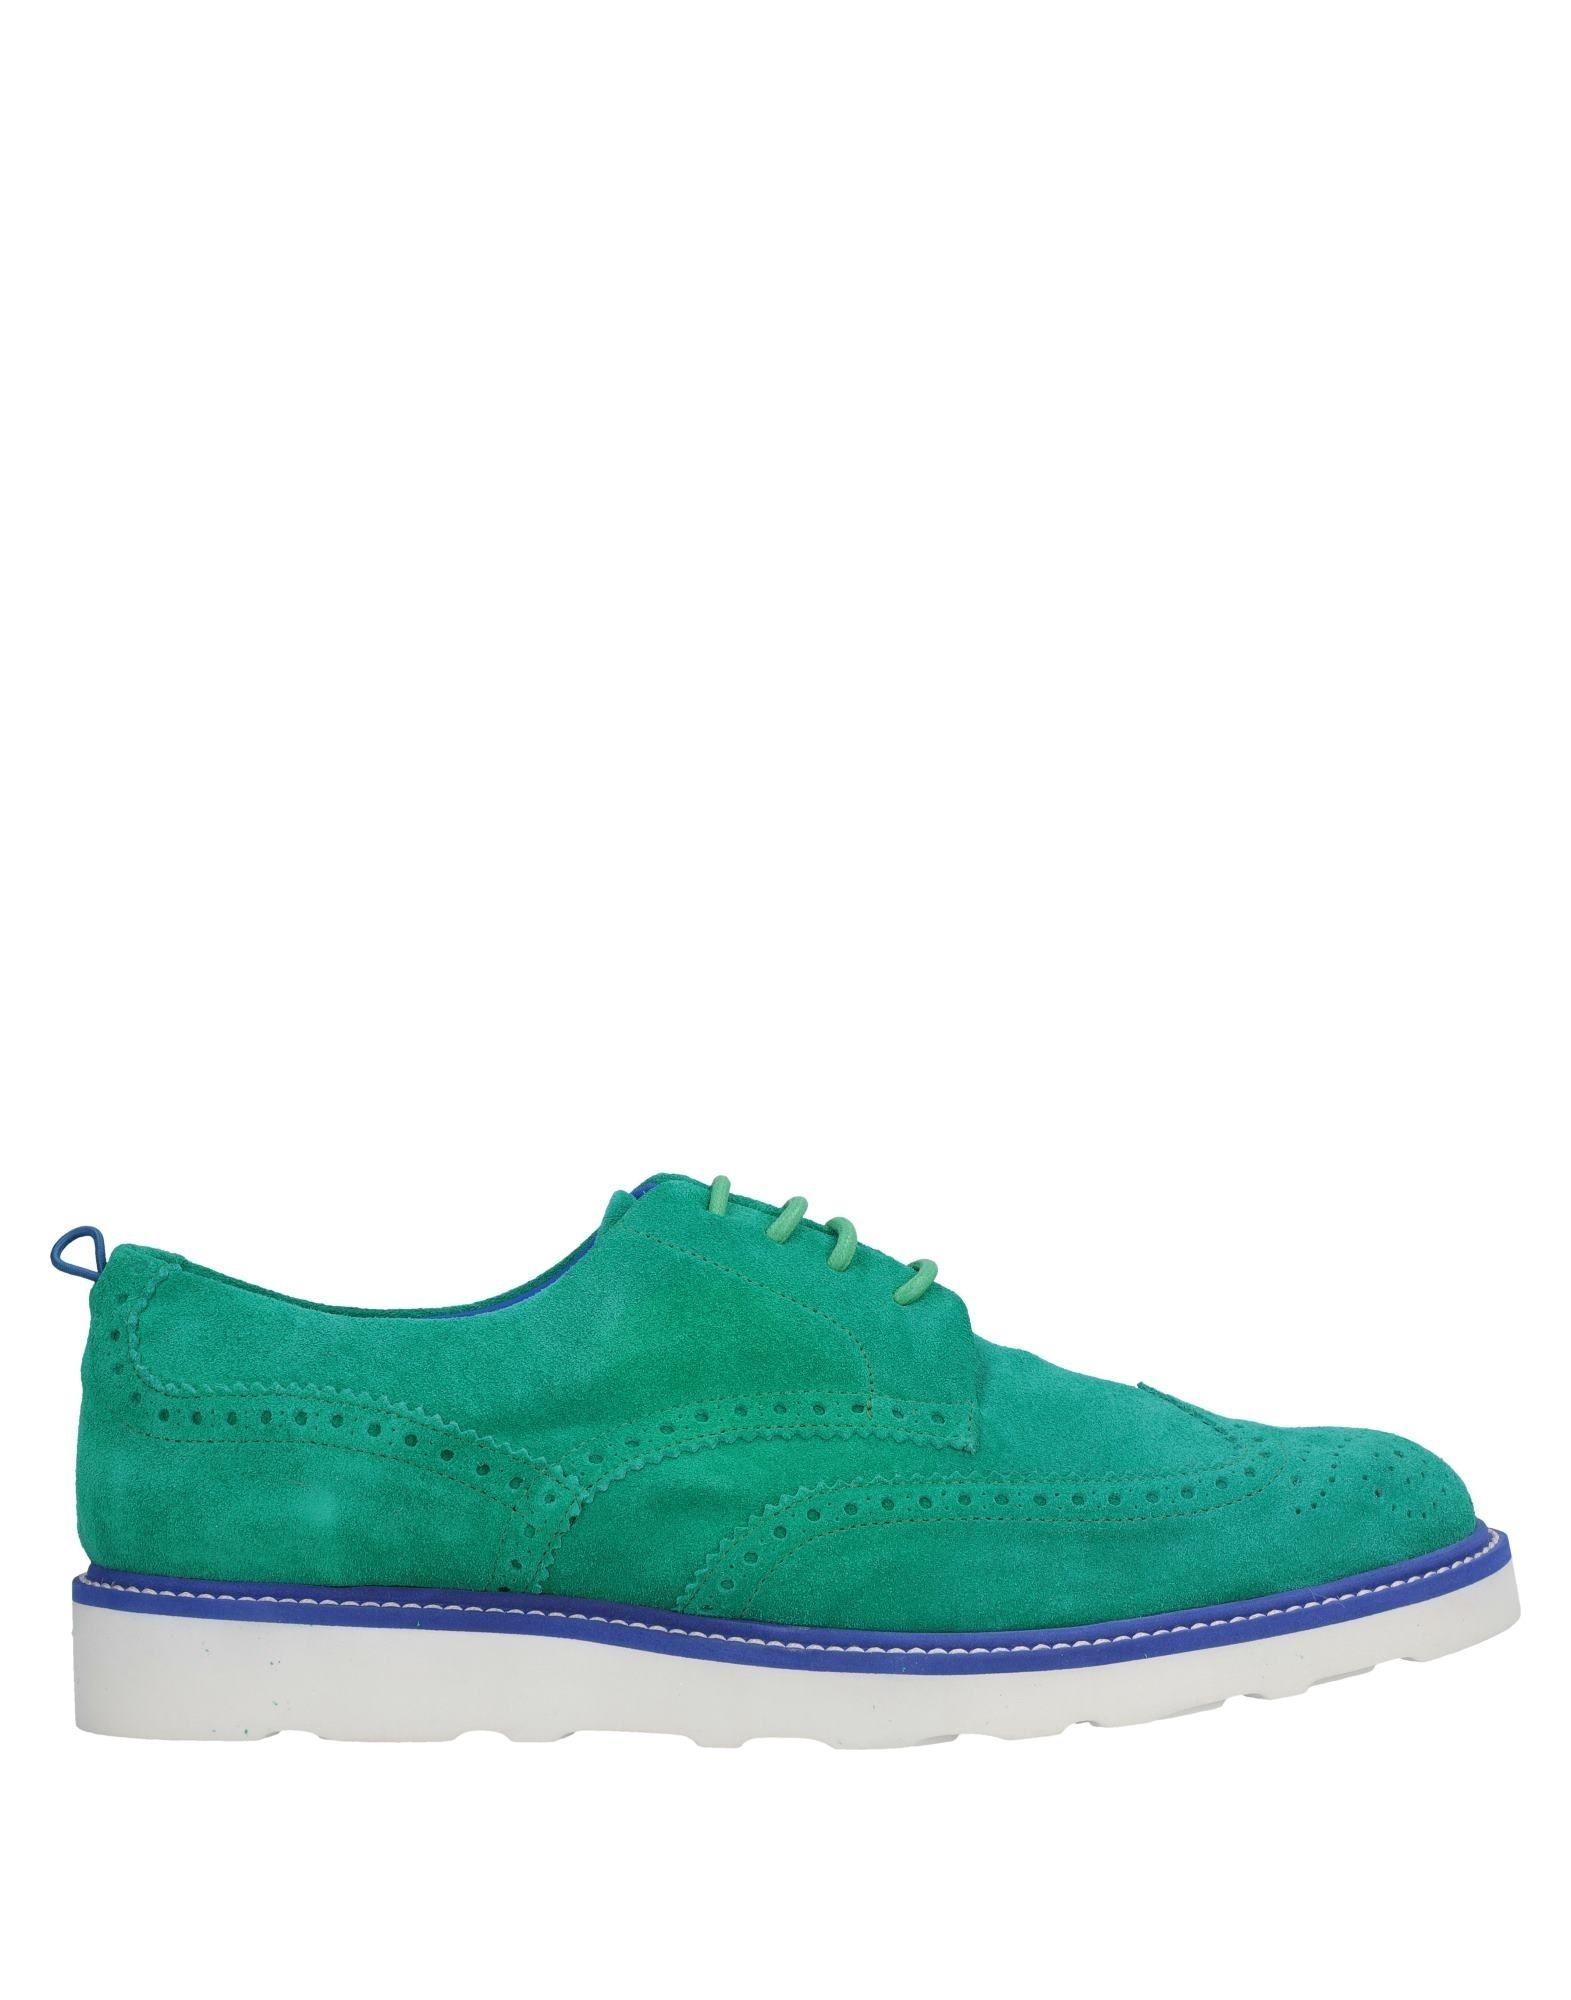 Rabatt echte Schuhe Pulchrum! Schnürschuhe Herren  11182169QB